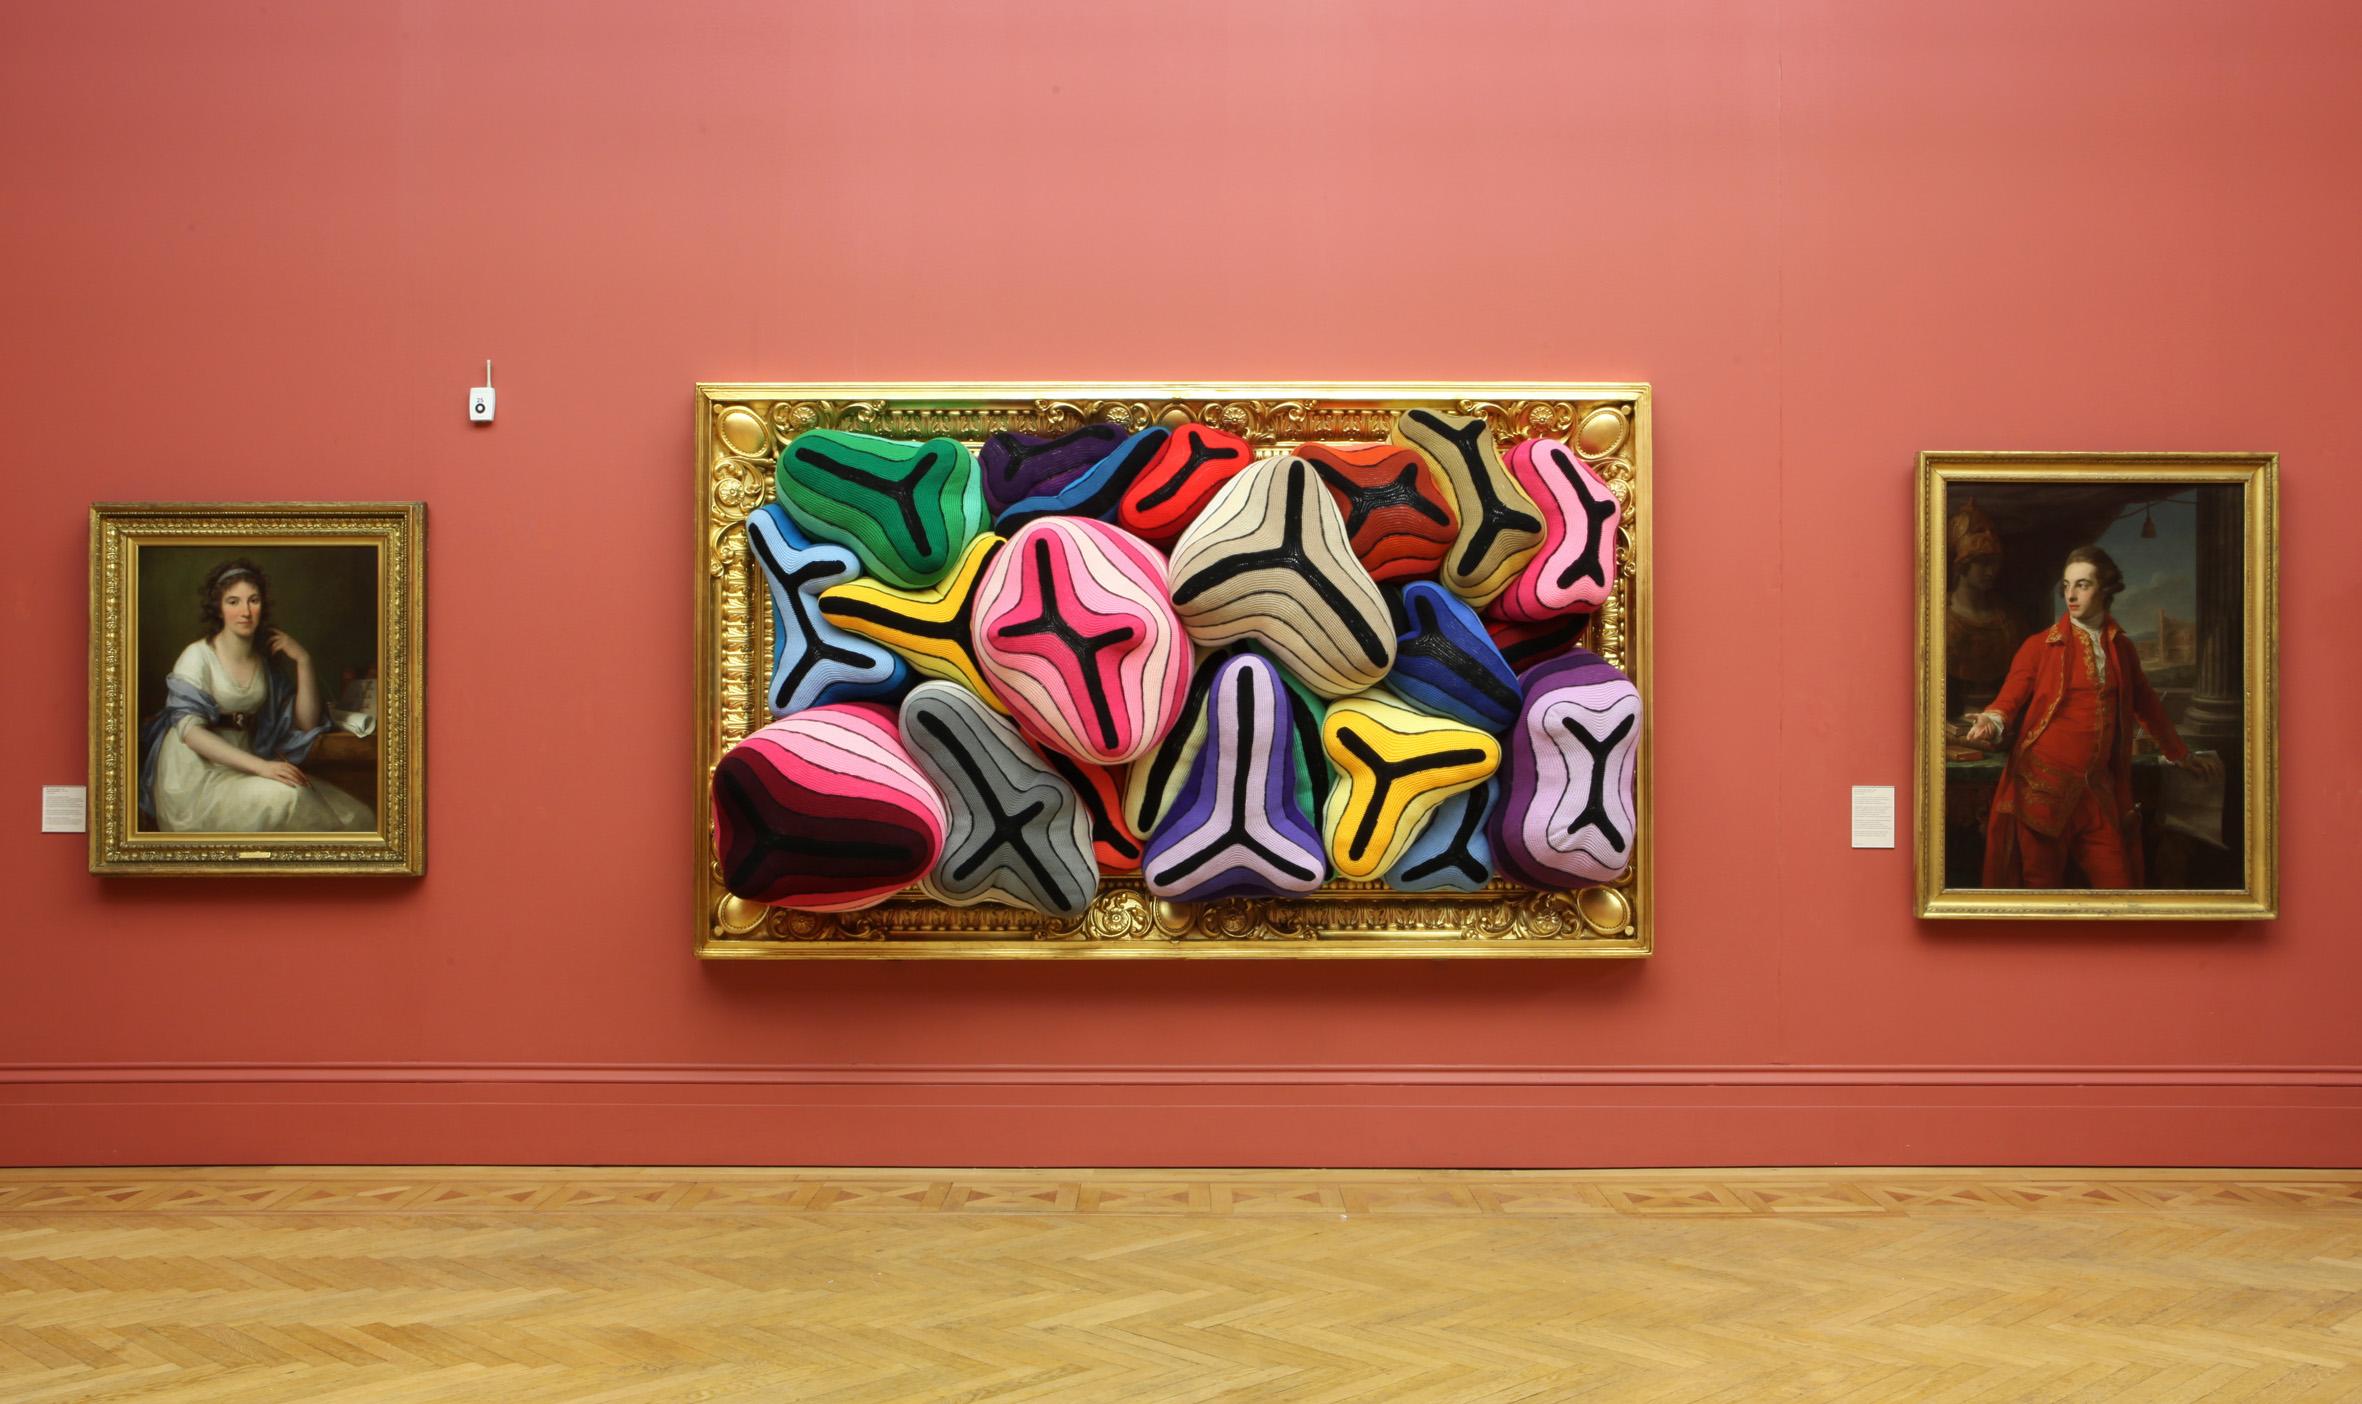 Online Art Galleries: A Convenient Way To Buy Original Artwork